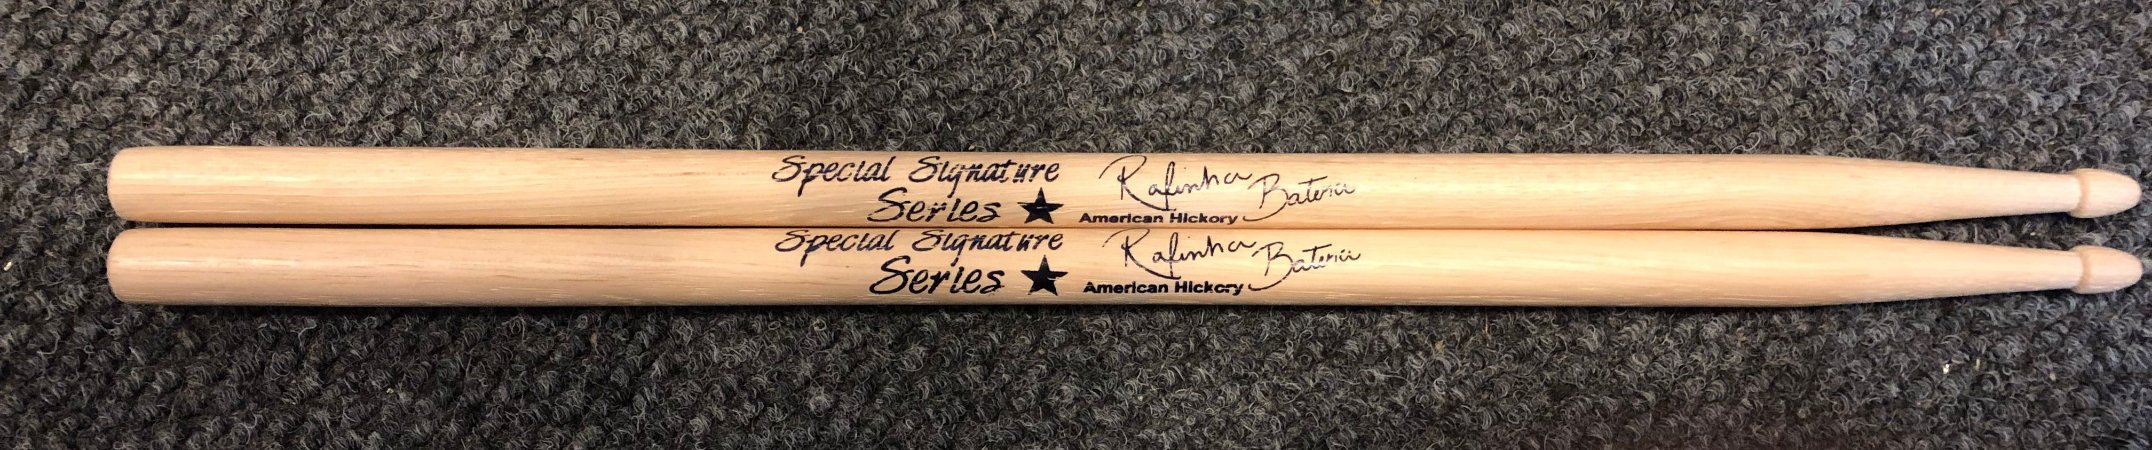 Baqueta Liverpool American Hickory Signature Rafinha Batera